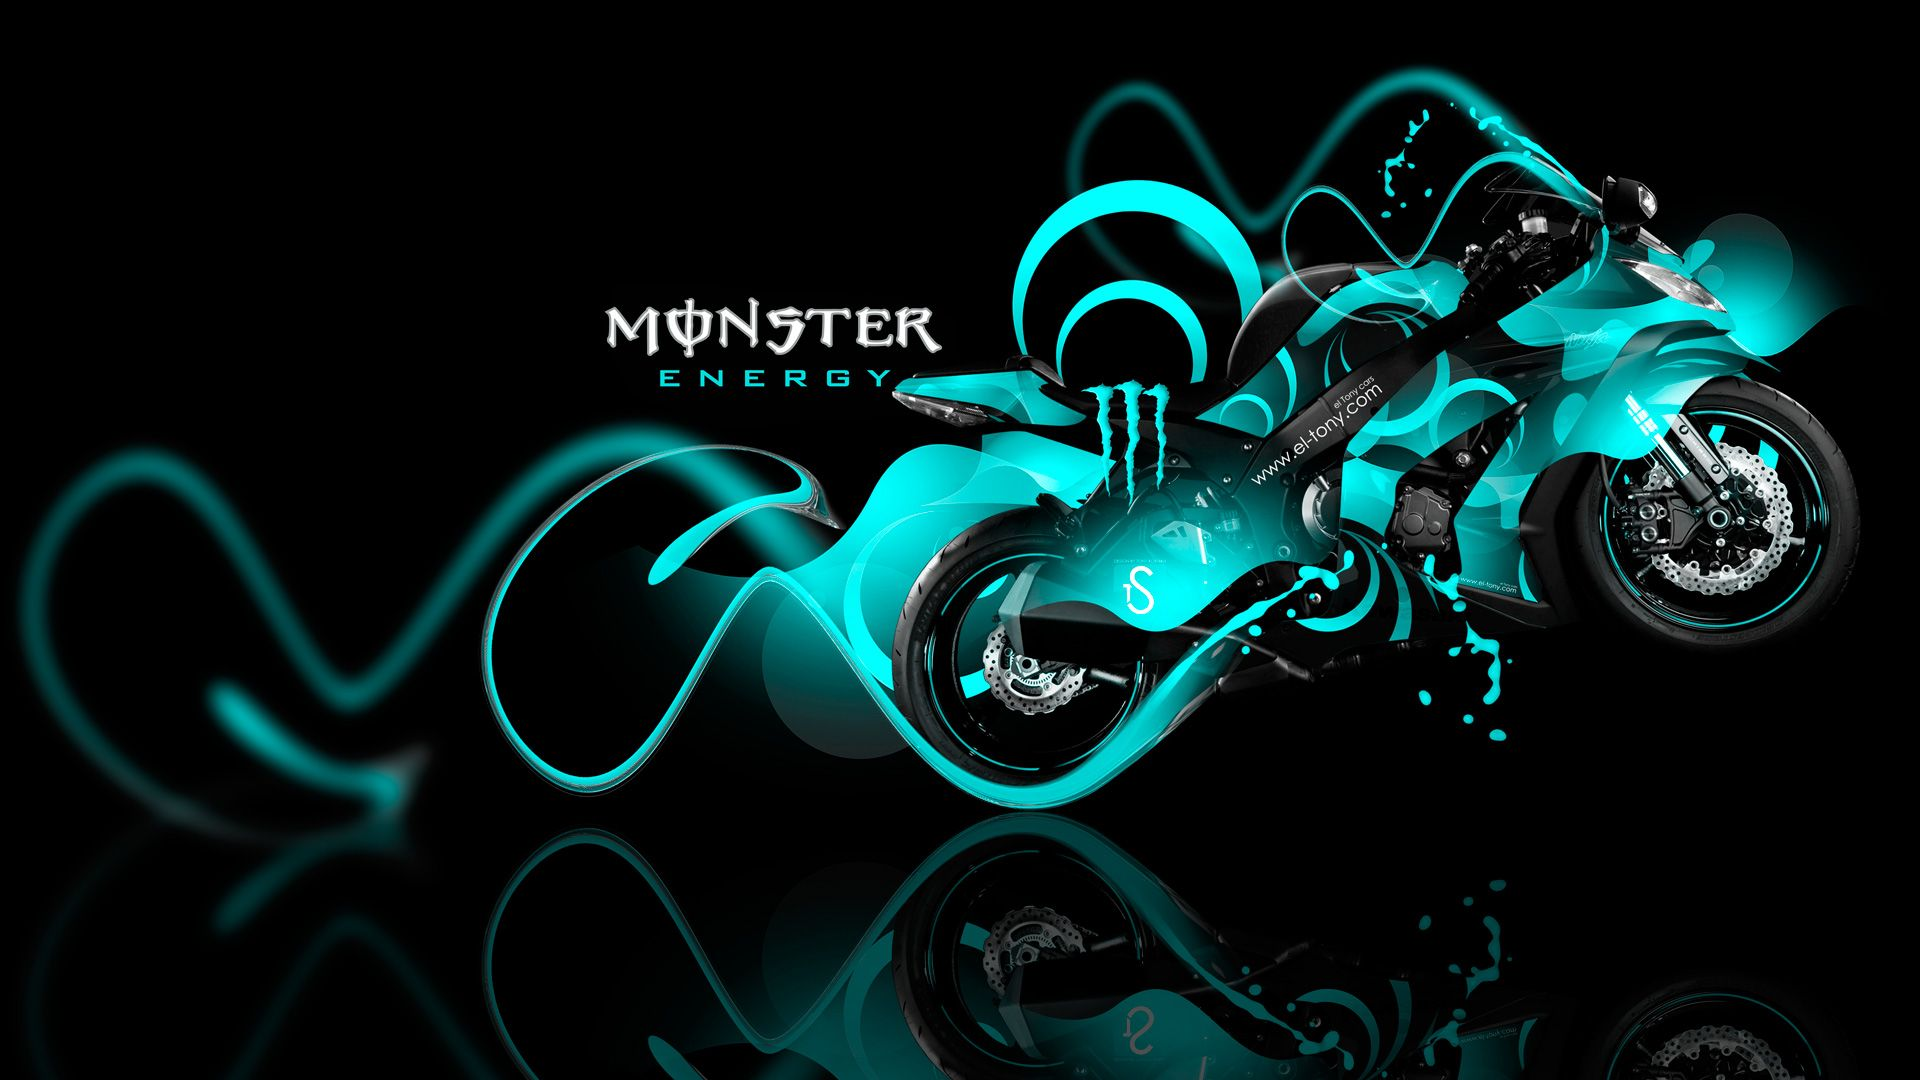 Monster Energy Kawasaki Ninja Azure Plastic Bike 14 Design By Tony Kokhan Www El Tony Com Jpg 19 1080